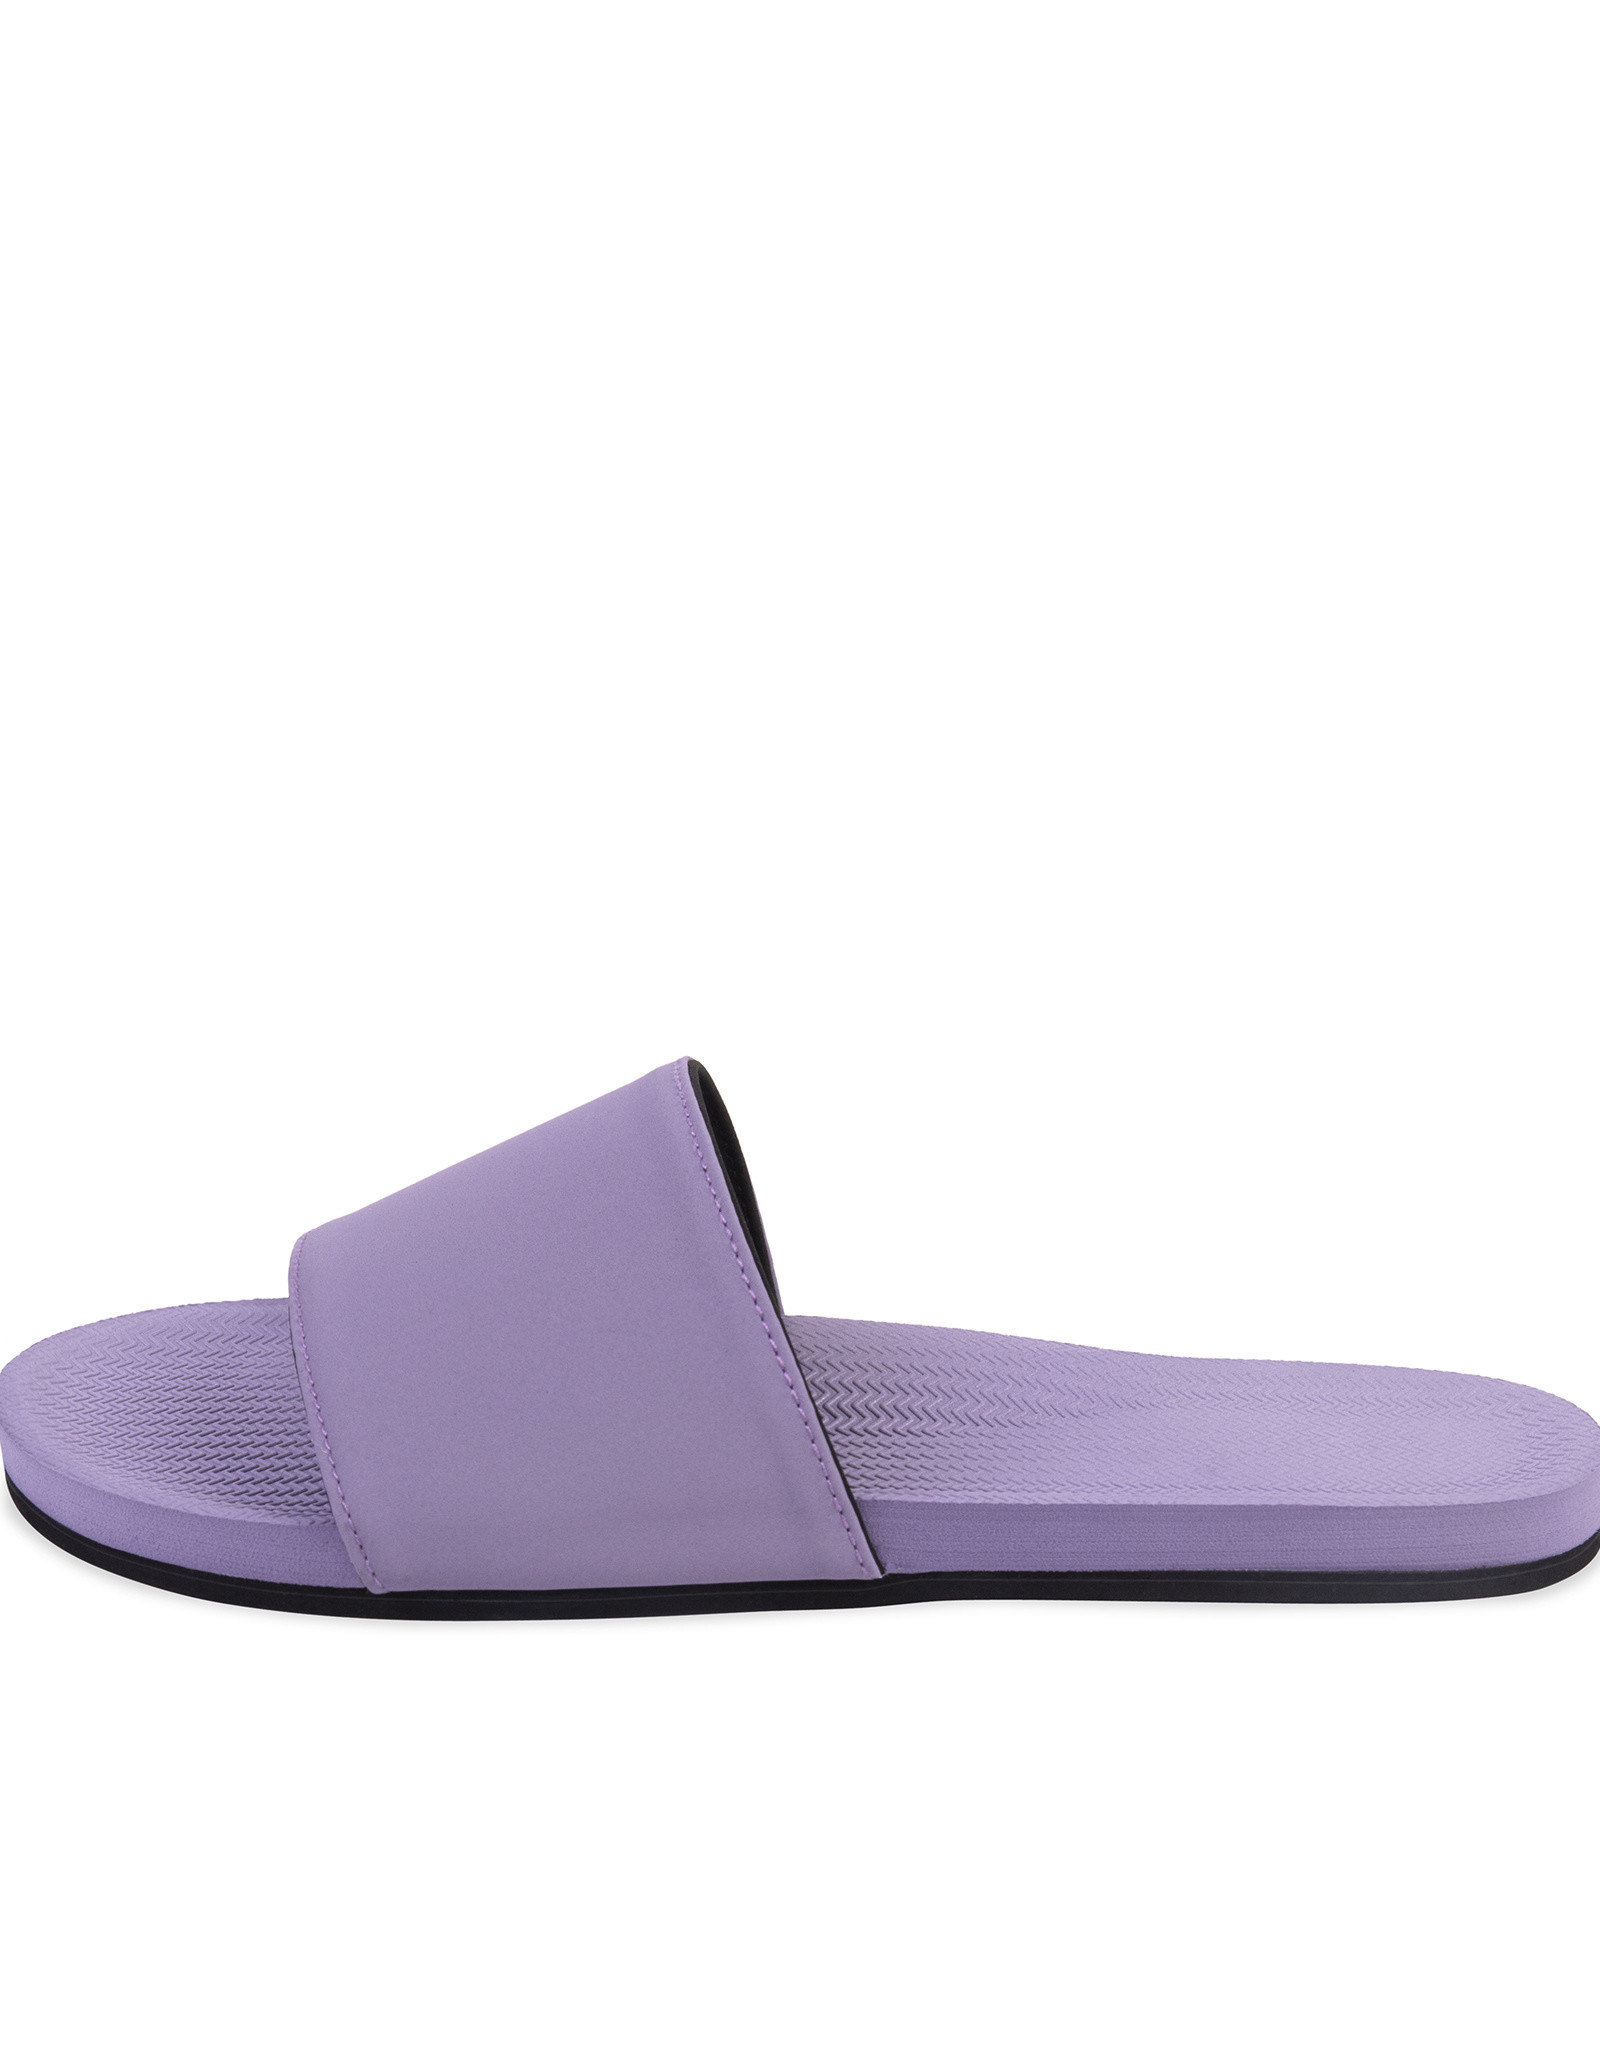 Indosole SLIDES Essential lilac